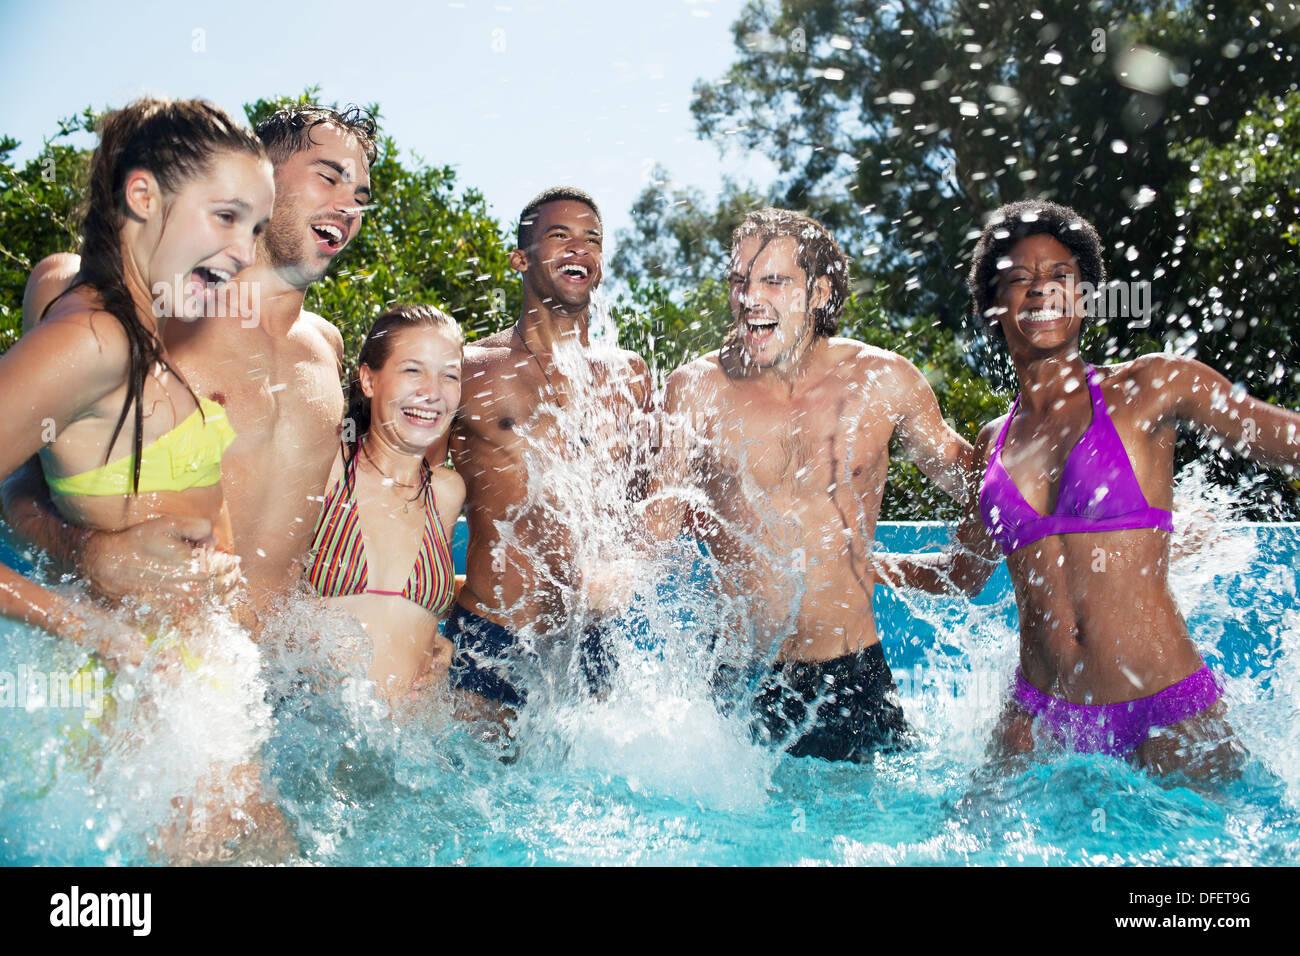 Amis jouant dans une piscine Photo Stock